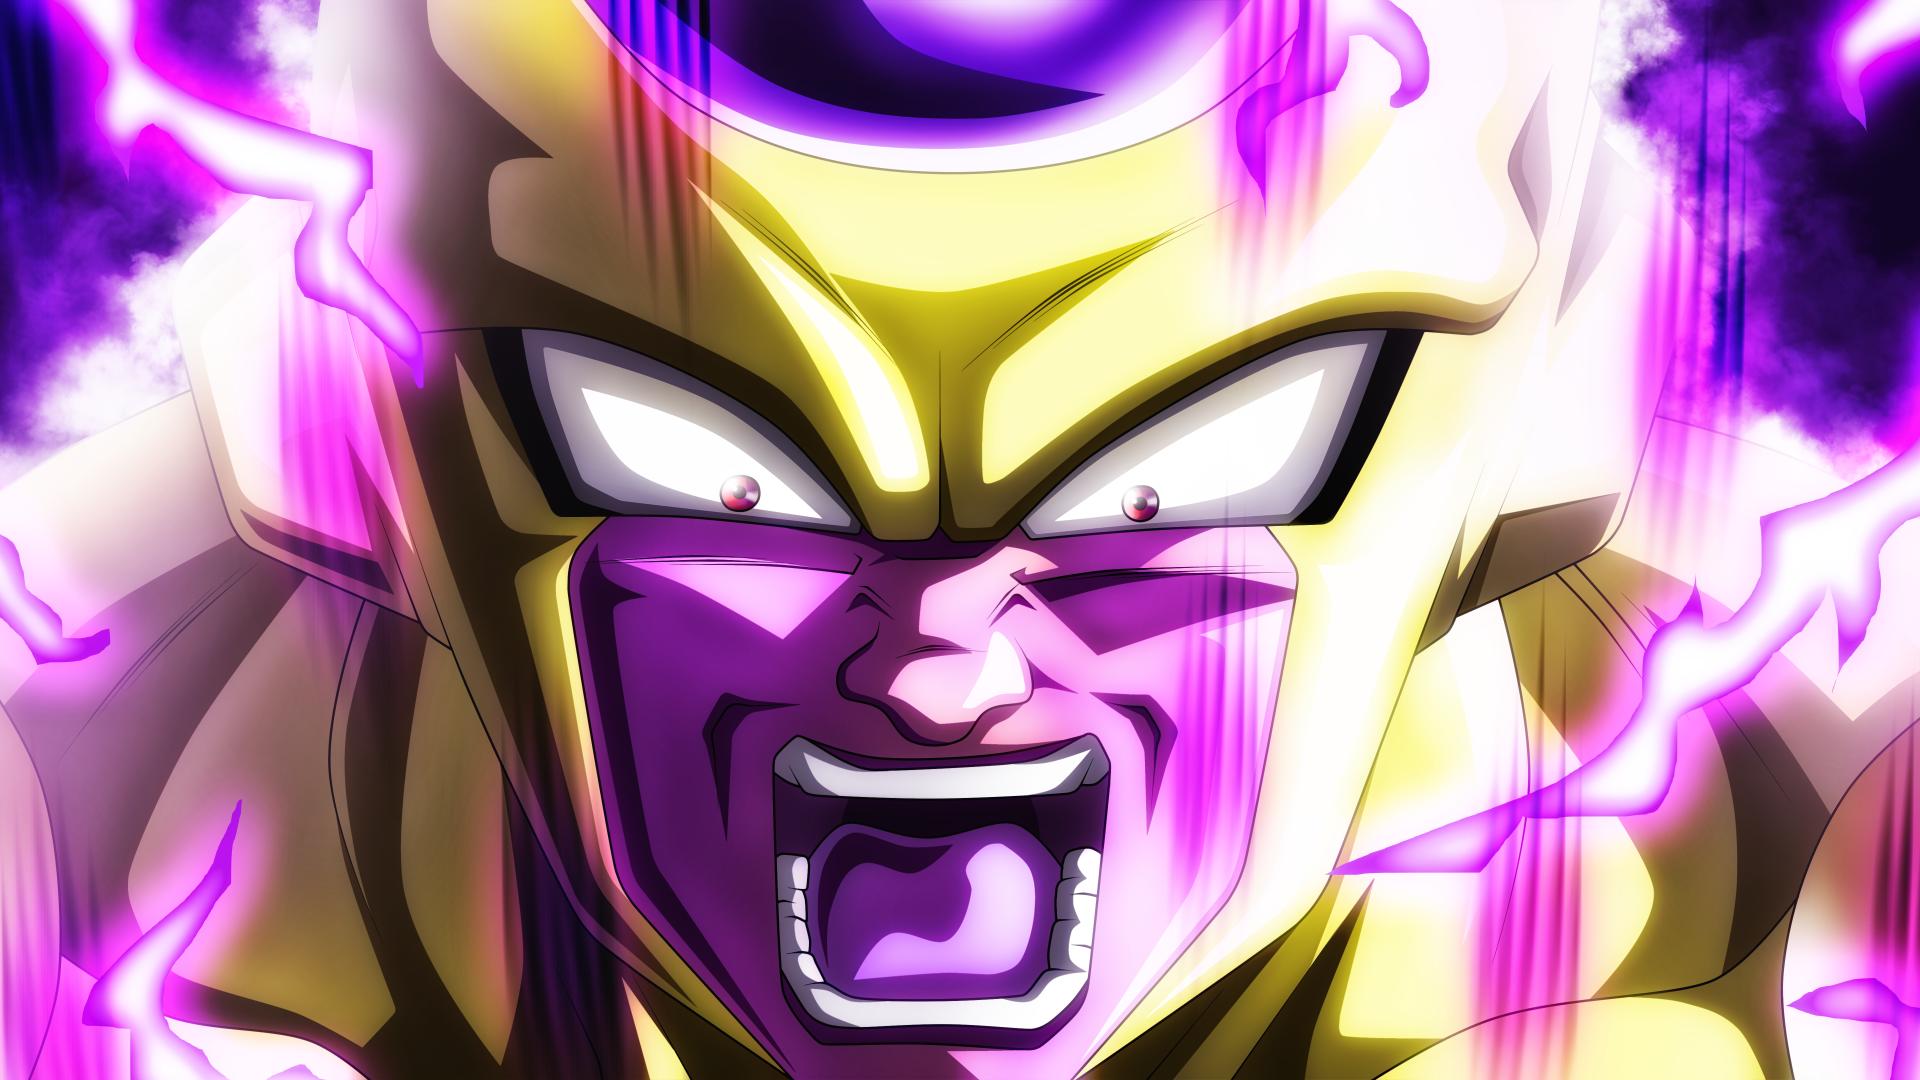 Goku Ultra Instinct Wallpaper Iphone X Dragon Ball Super 5k Retina Ultra Hd Wallpaper